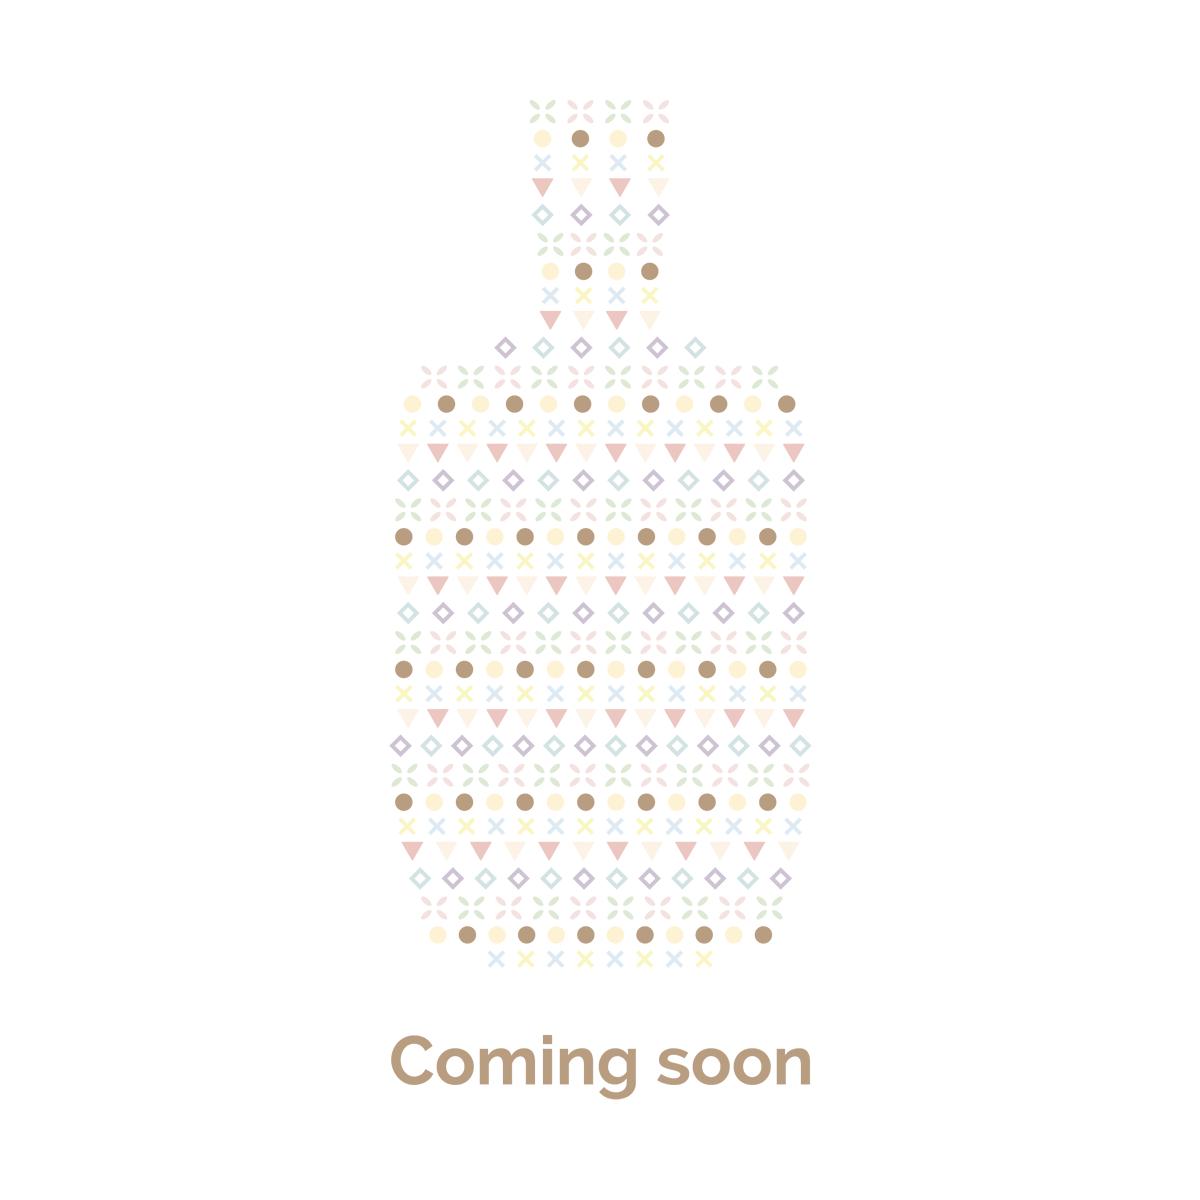 Linea Alcool - Coming soon.